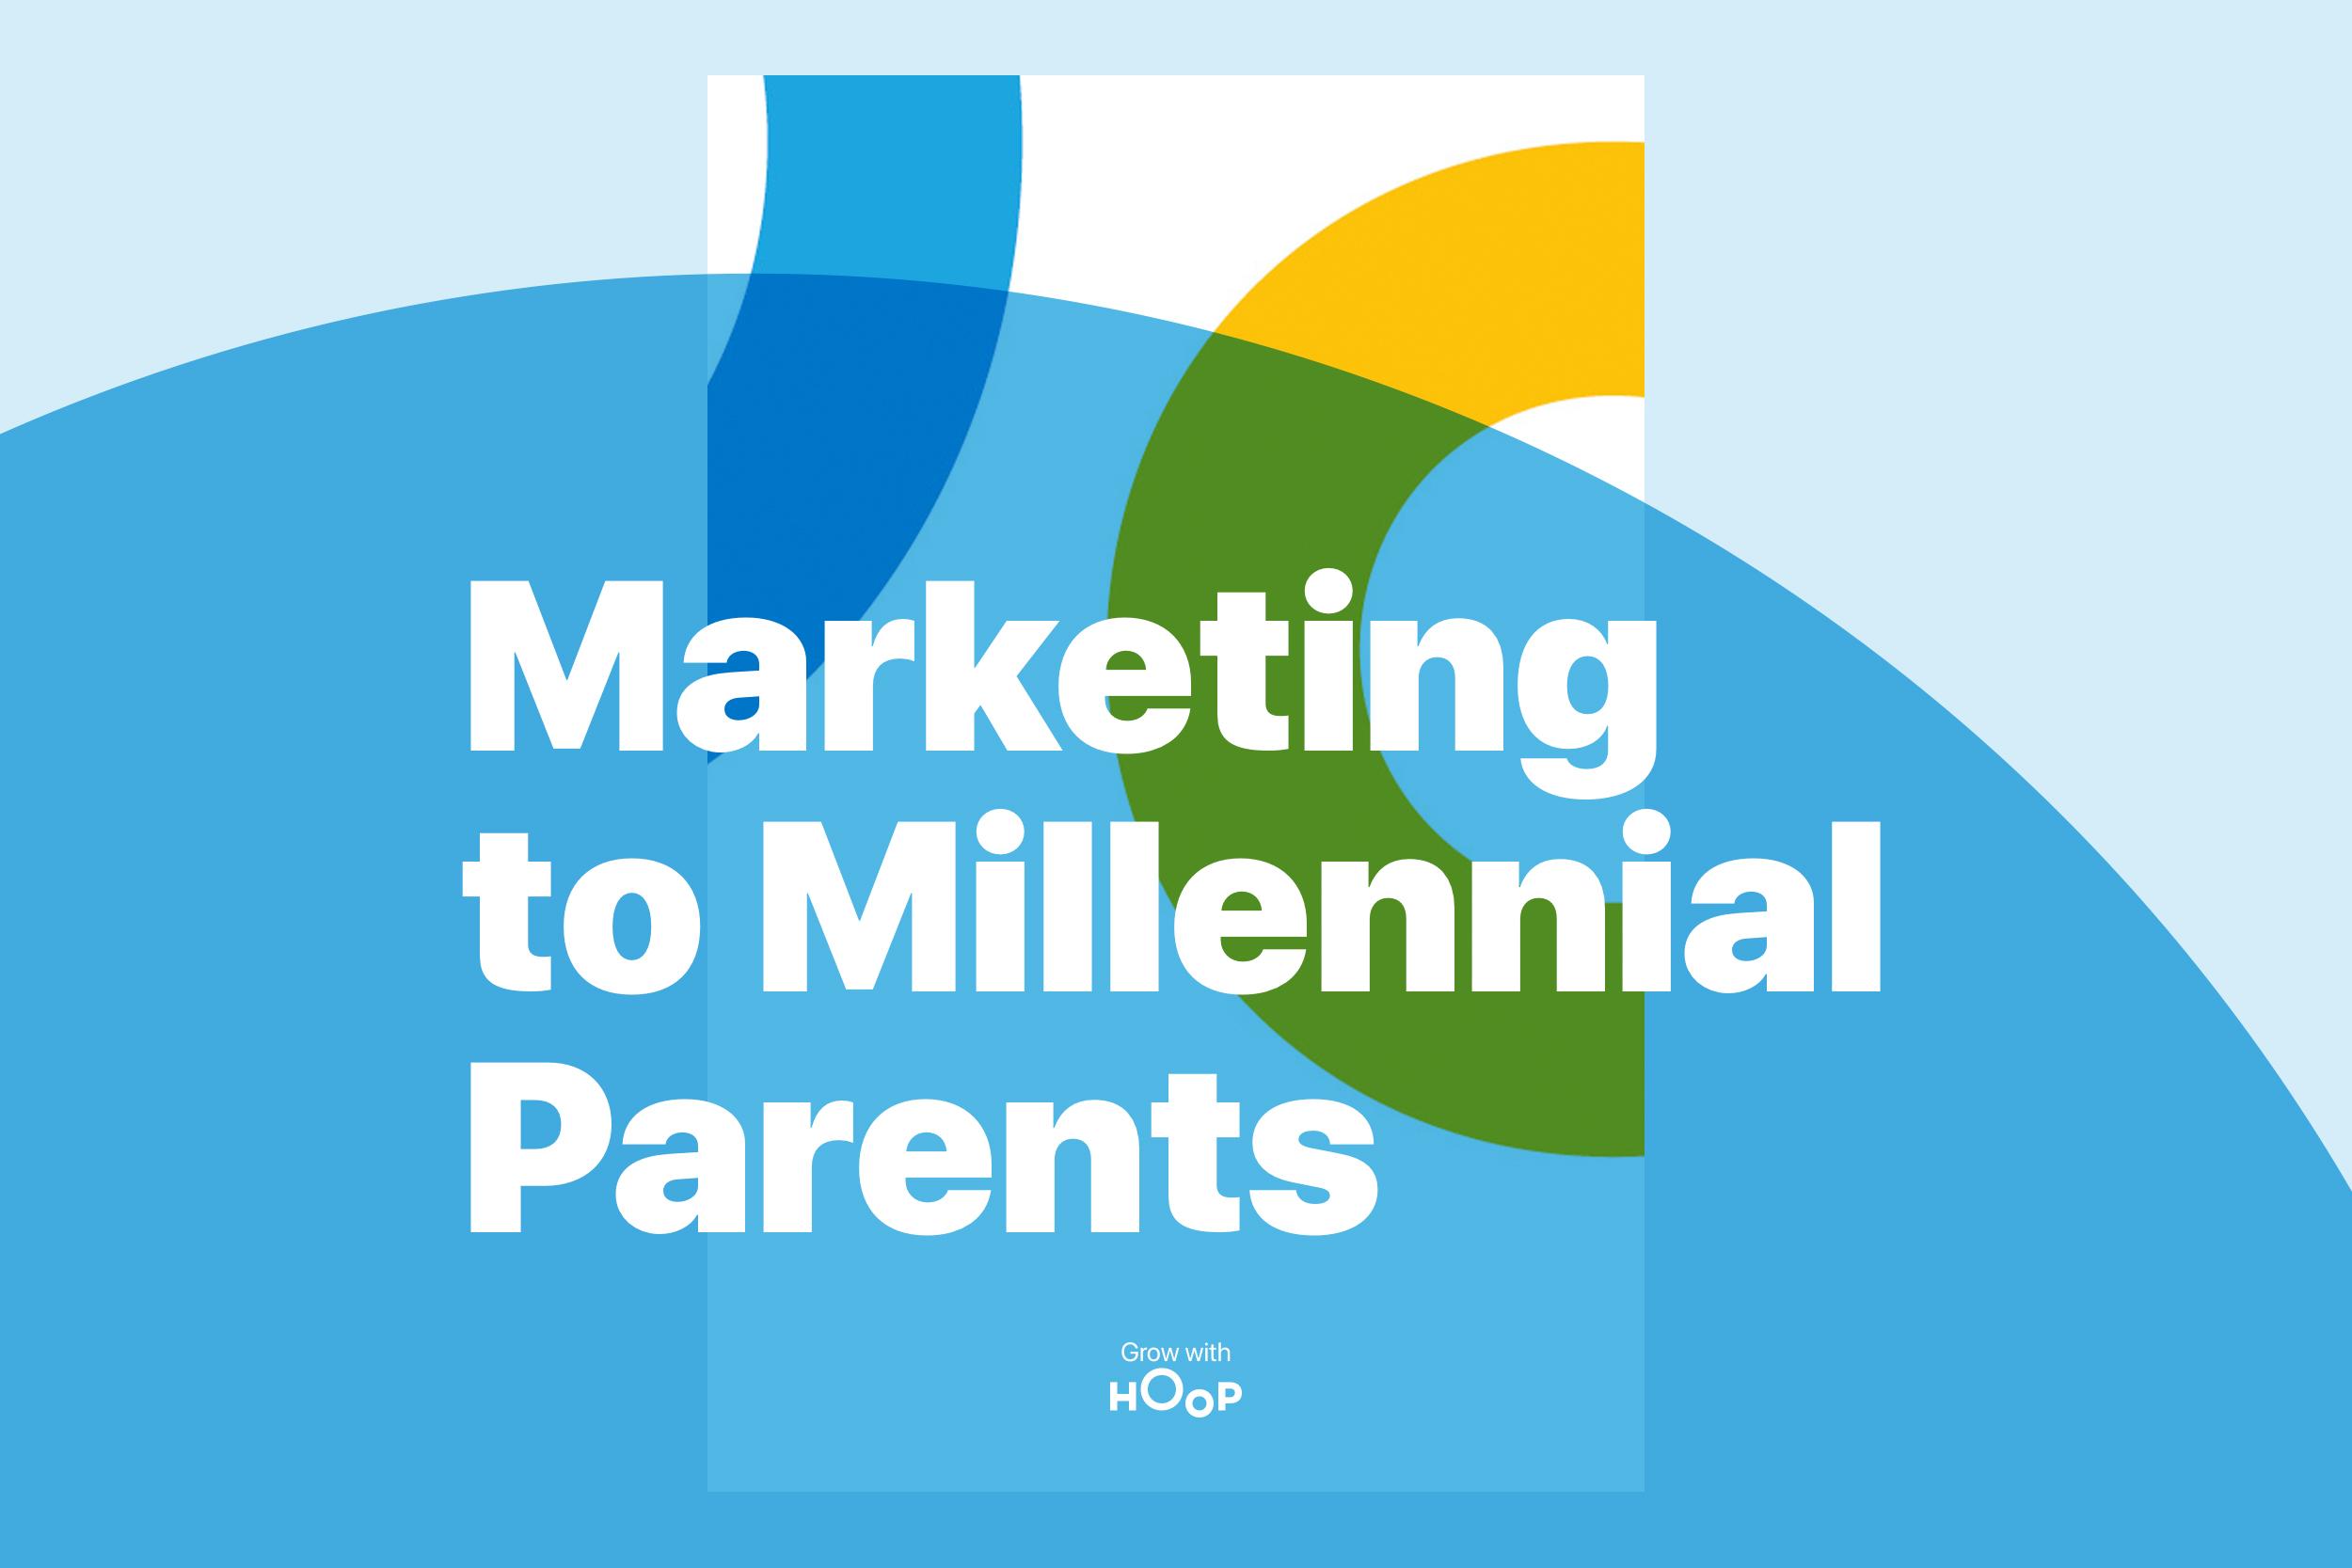 190225_Cover_Marketing to Millennials.jpg